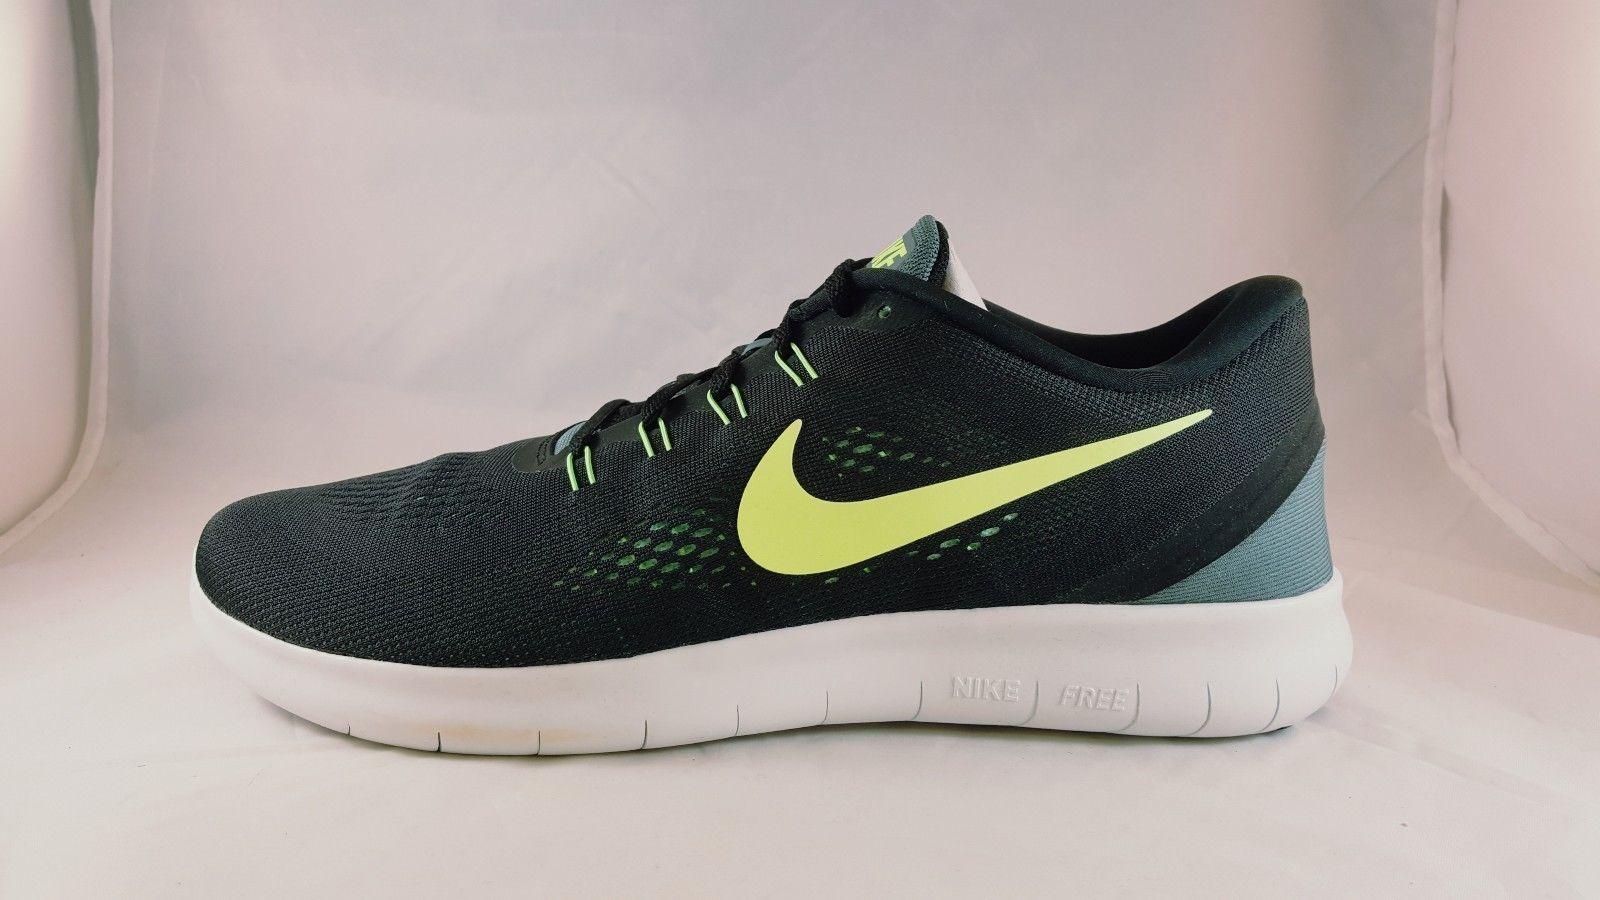 Nike Free RN Men's Running shoes 831508 006 Size 10